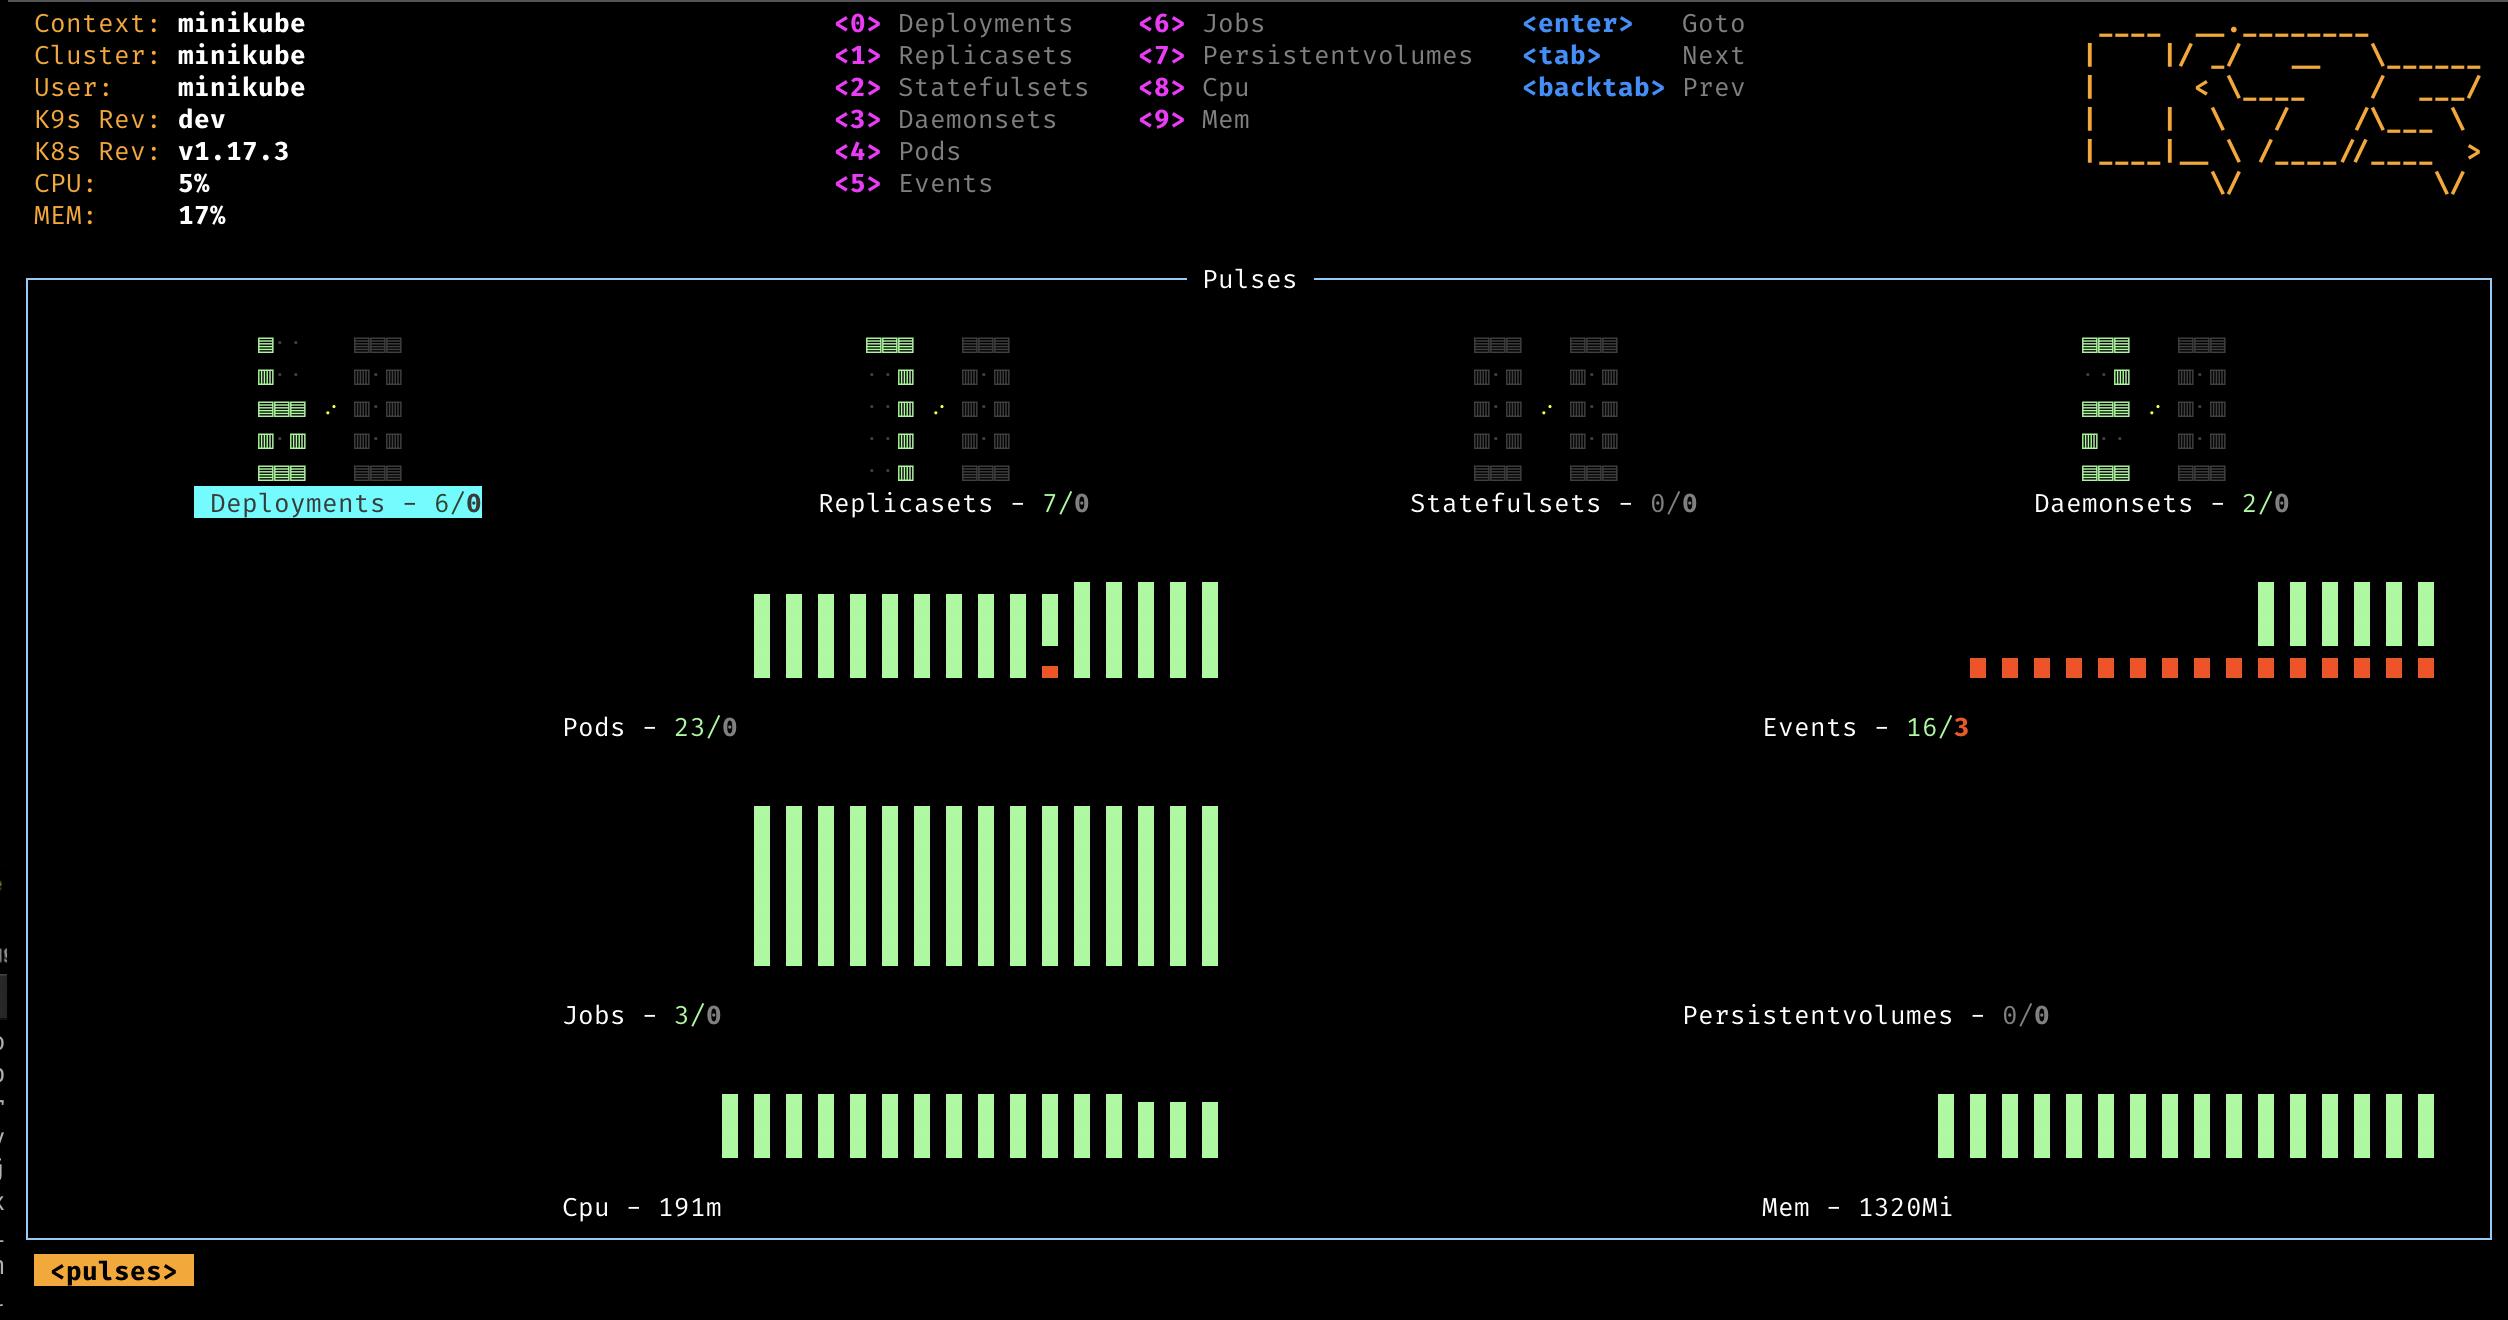 Kubernetes 集群监控和管理工具 k9s